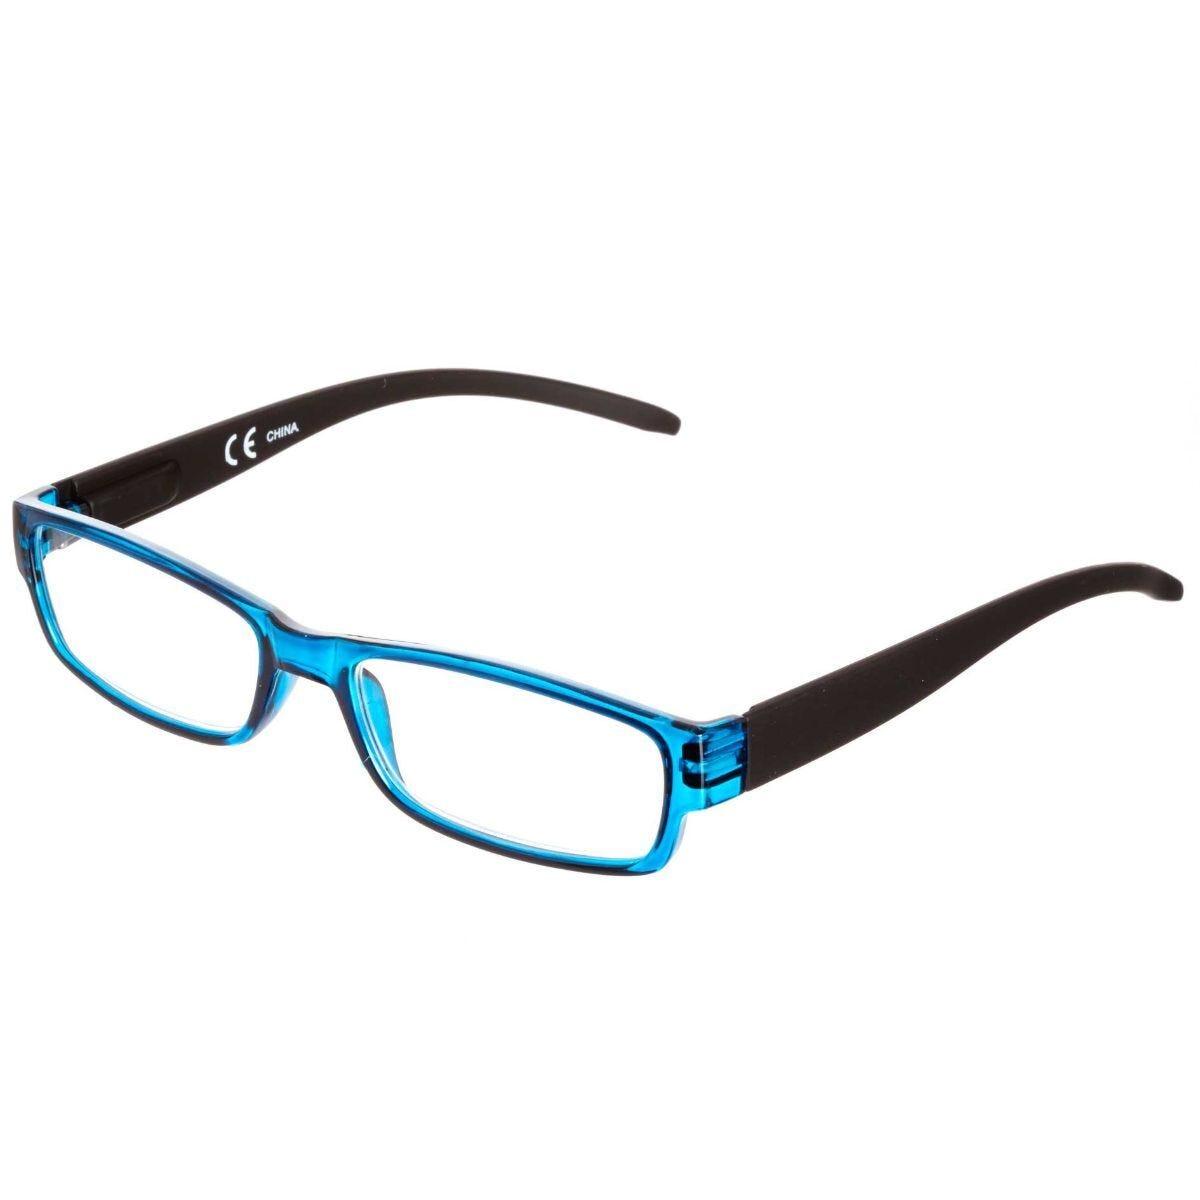 Ryman Reading Glasses + 1.5 Blue Plastic Frame